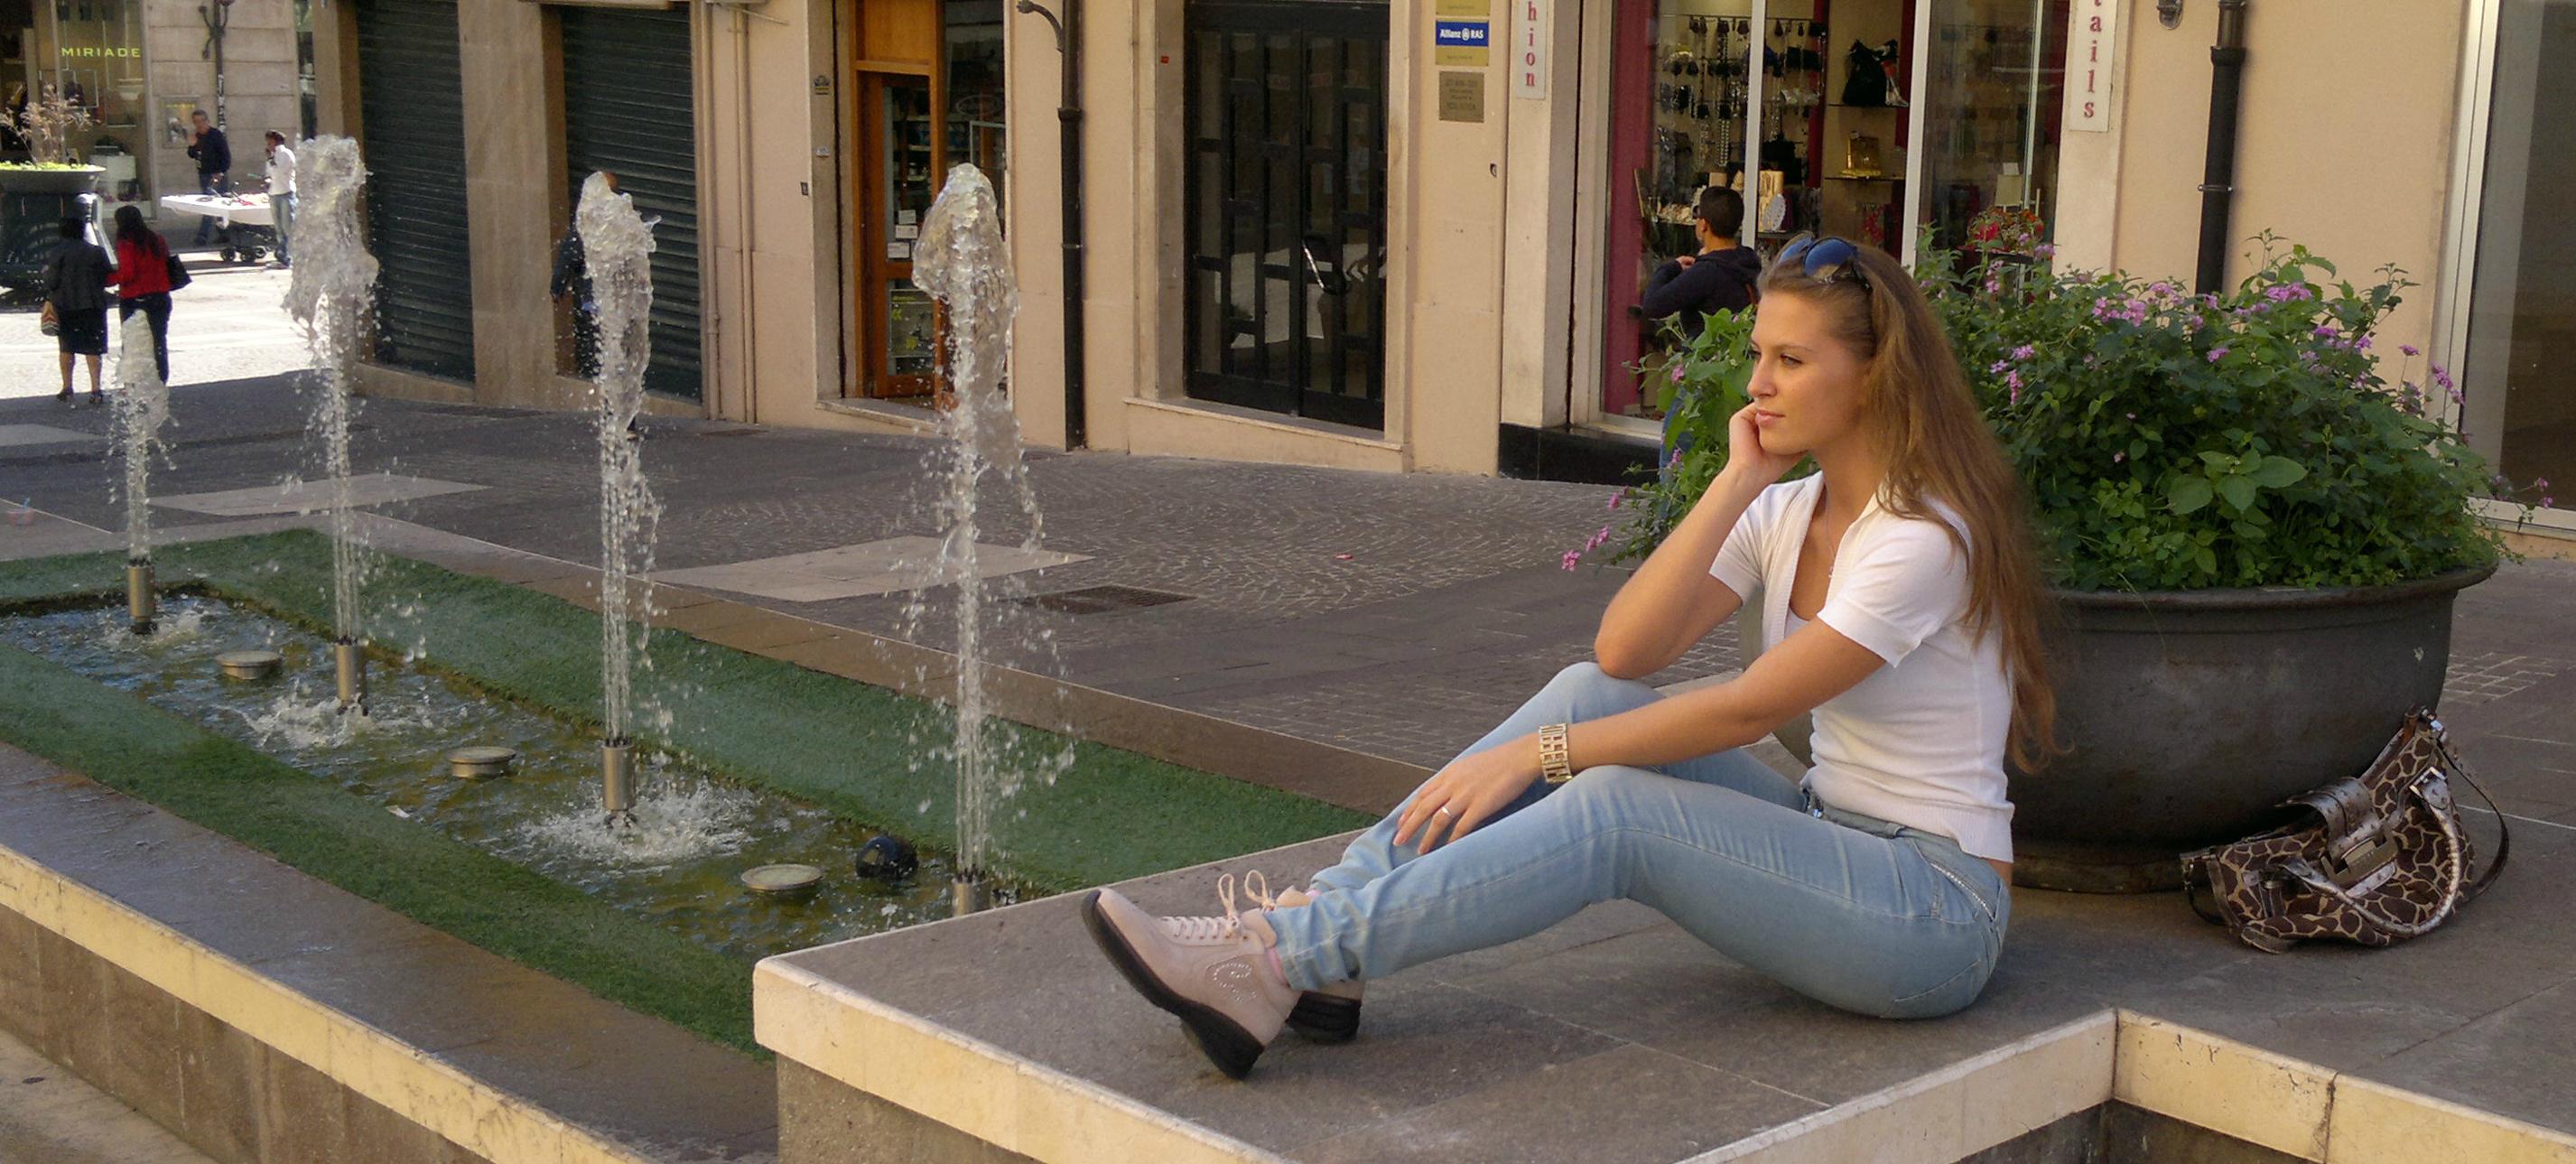 Violetta Solonko Violettas shopping